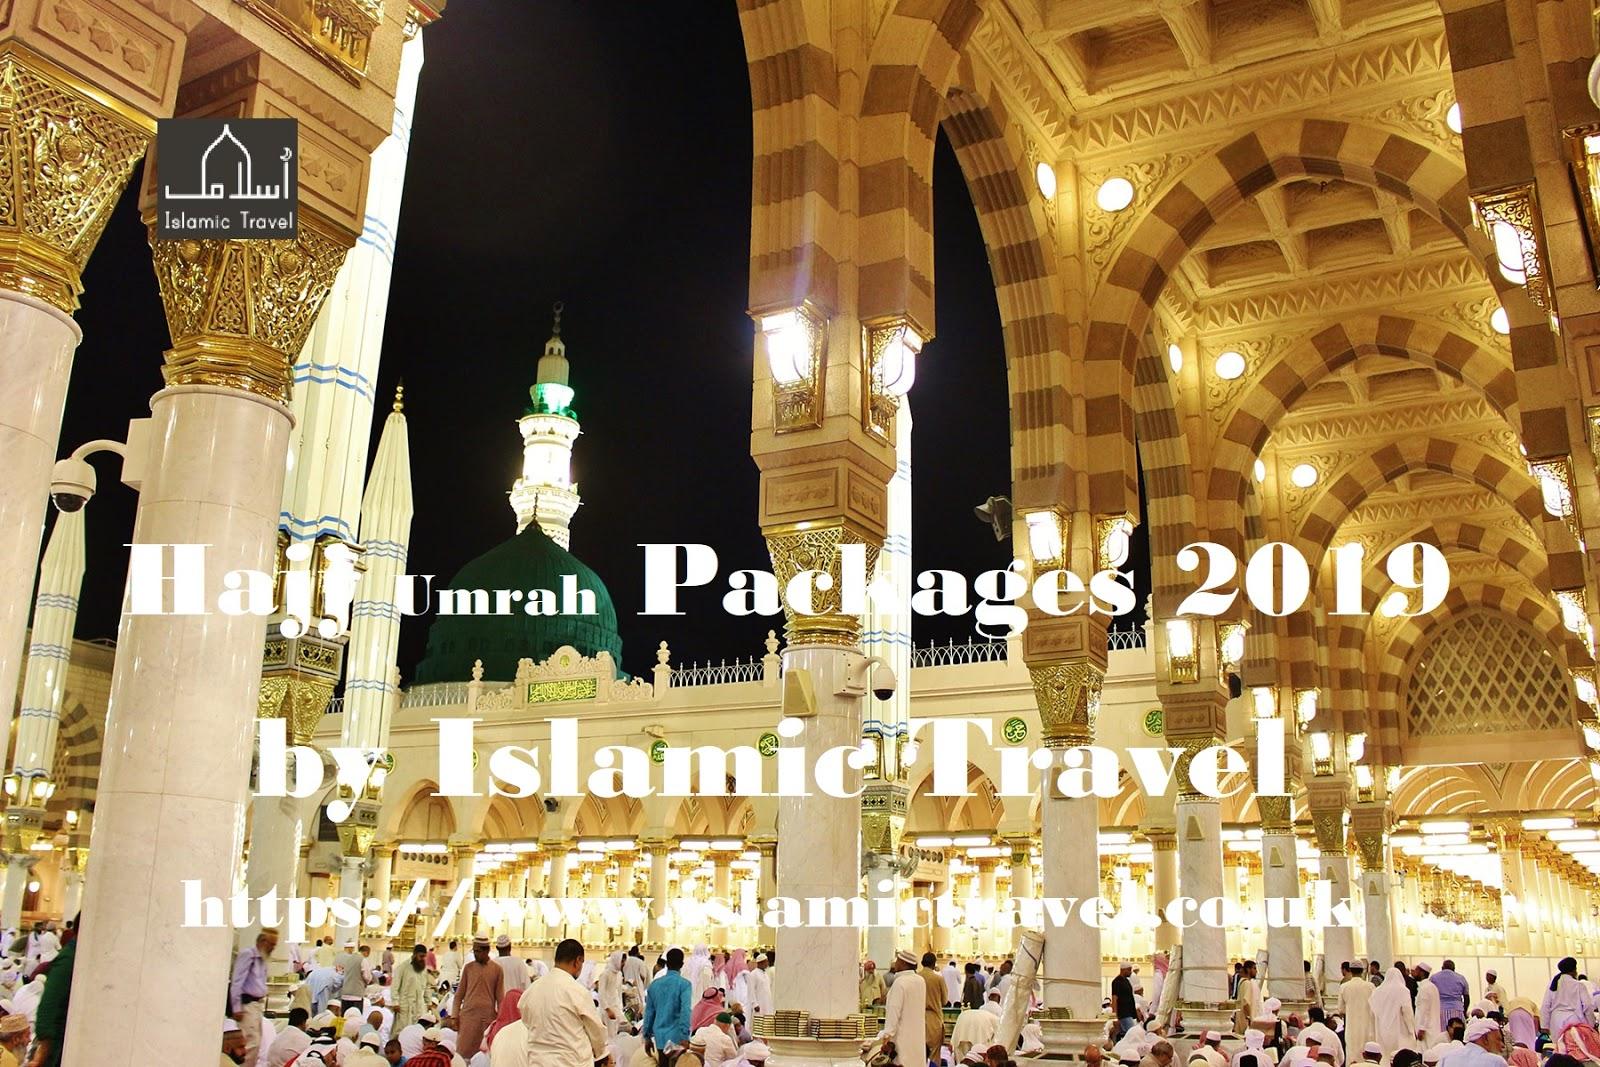 Umrah Banner: Umrah Travel: Hajj Umrah Packages 2019 With Flights By